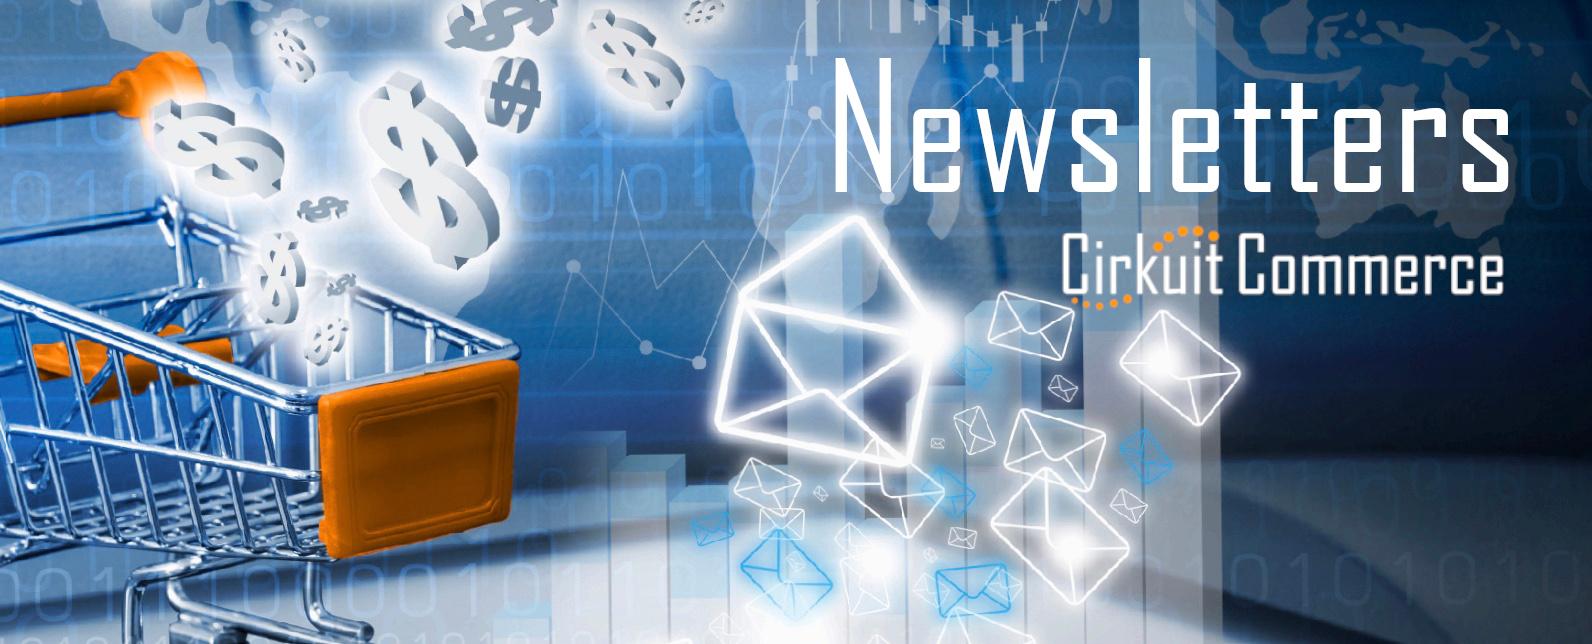 Cirkuit Commerce Newsletter Marketing Feature Update